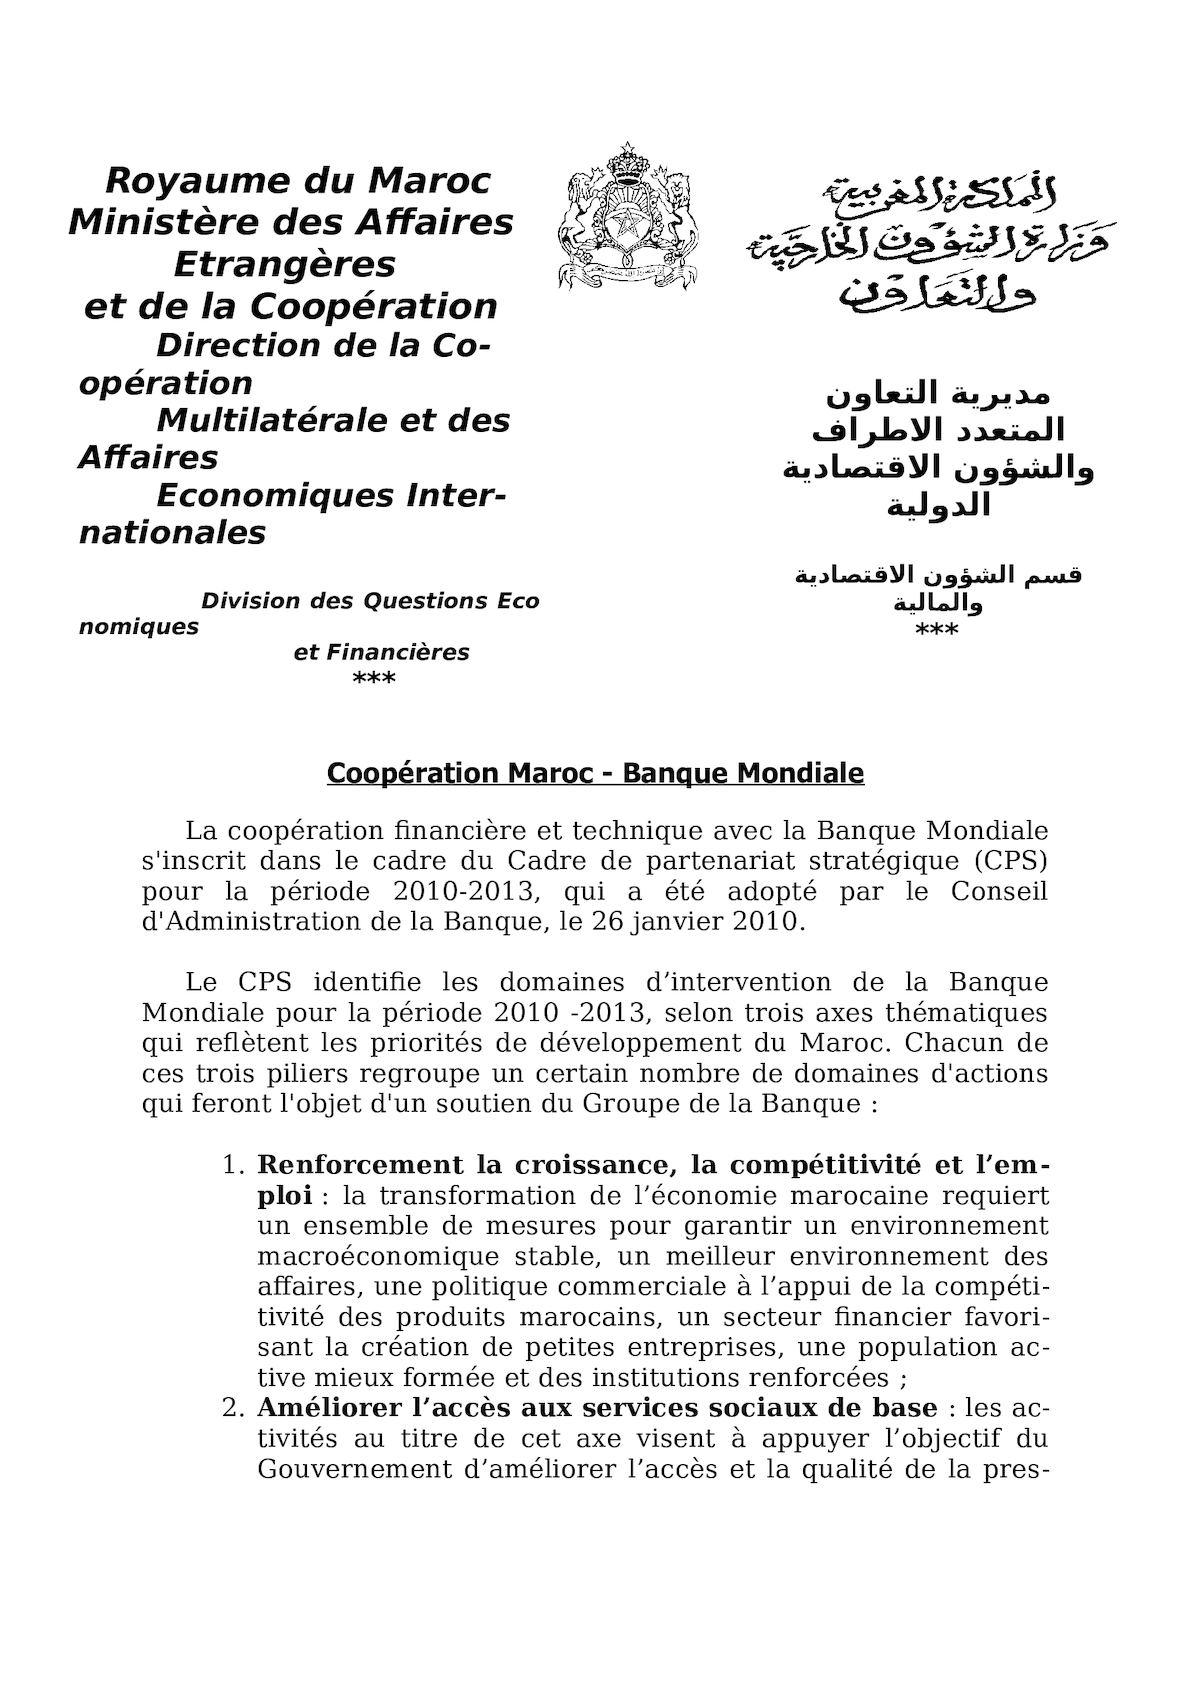 Coopération Maroc BM